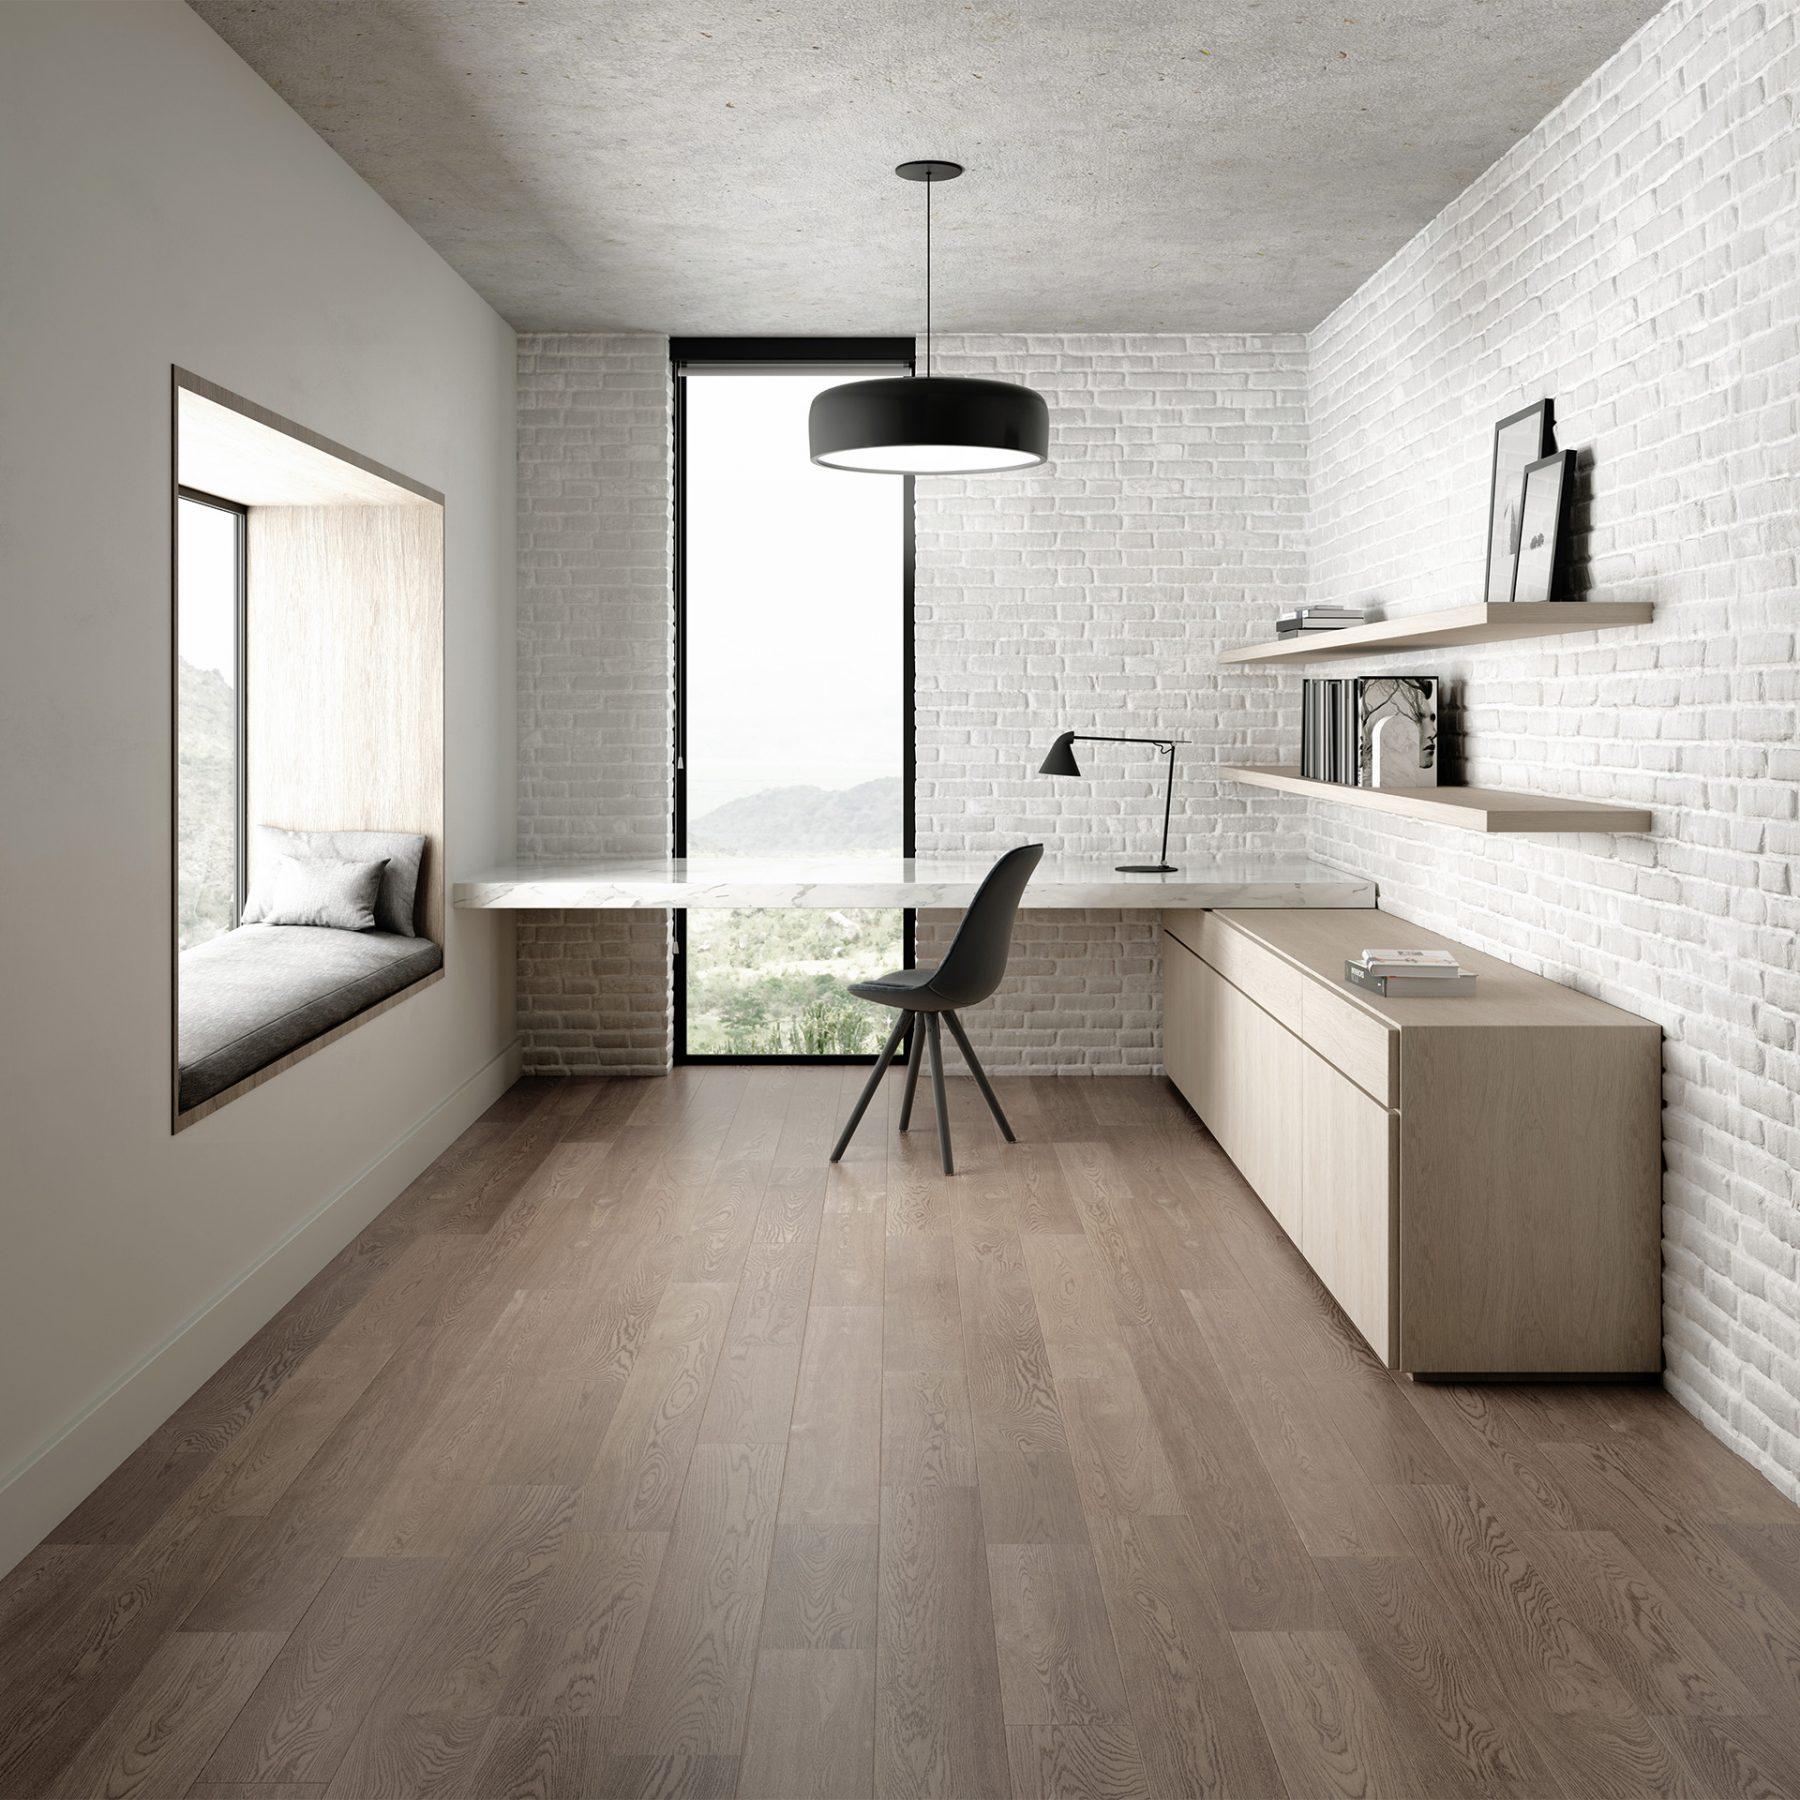 rendering-service-brick-wall-basement